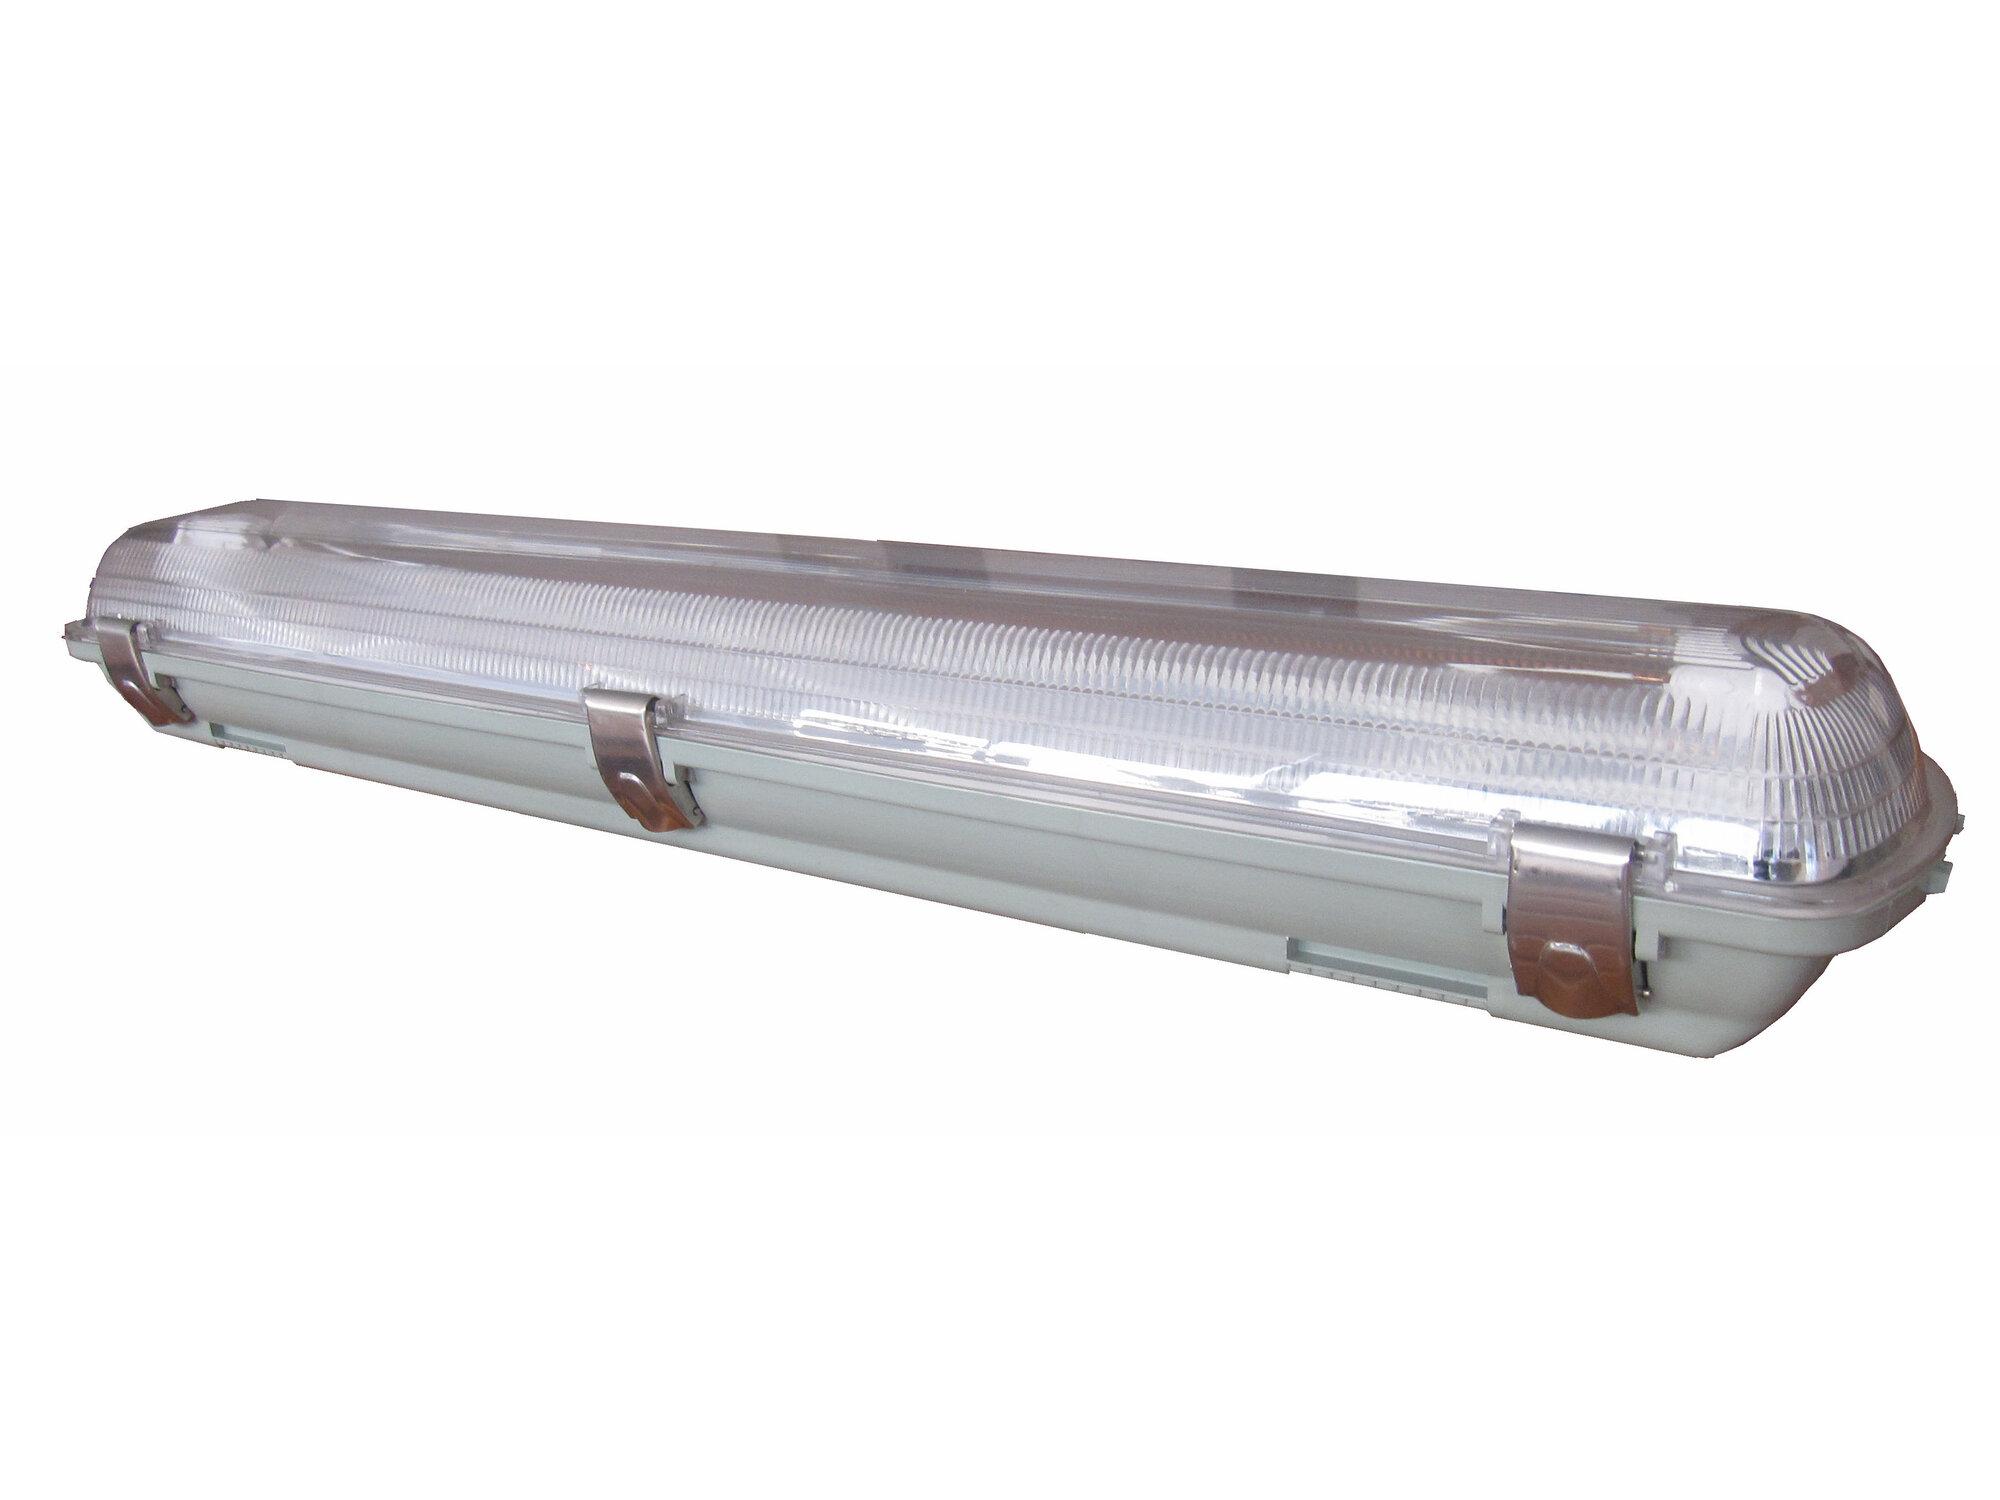 Cla Lighting 2 Light 28w Low Profile Outdoor Weatherproof Fitting At Wayfair Ebay